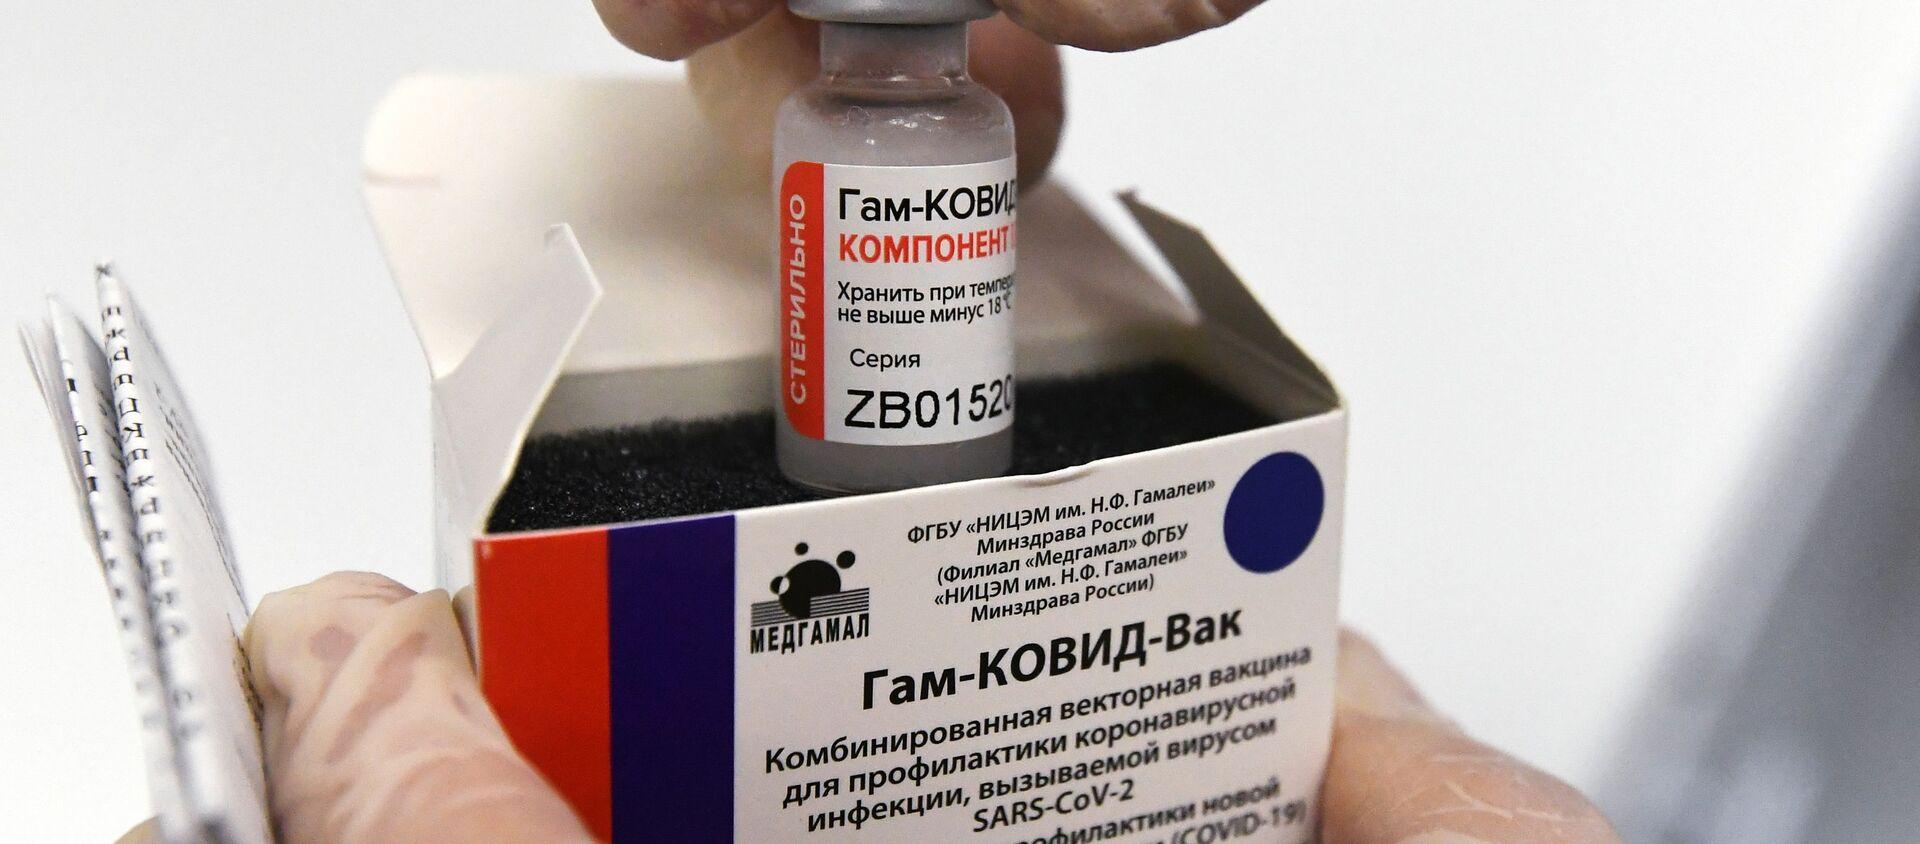 Медсестра достаёт ампулу с вакциной против COVID-19 Спутник V  - Sputnik Грузия, 1920, 09.02.2021